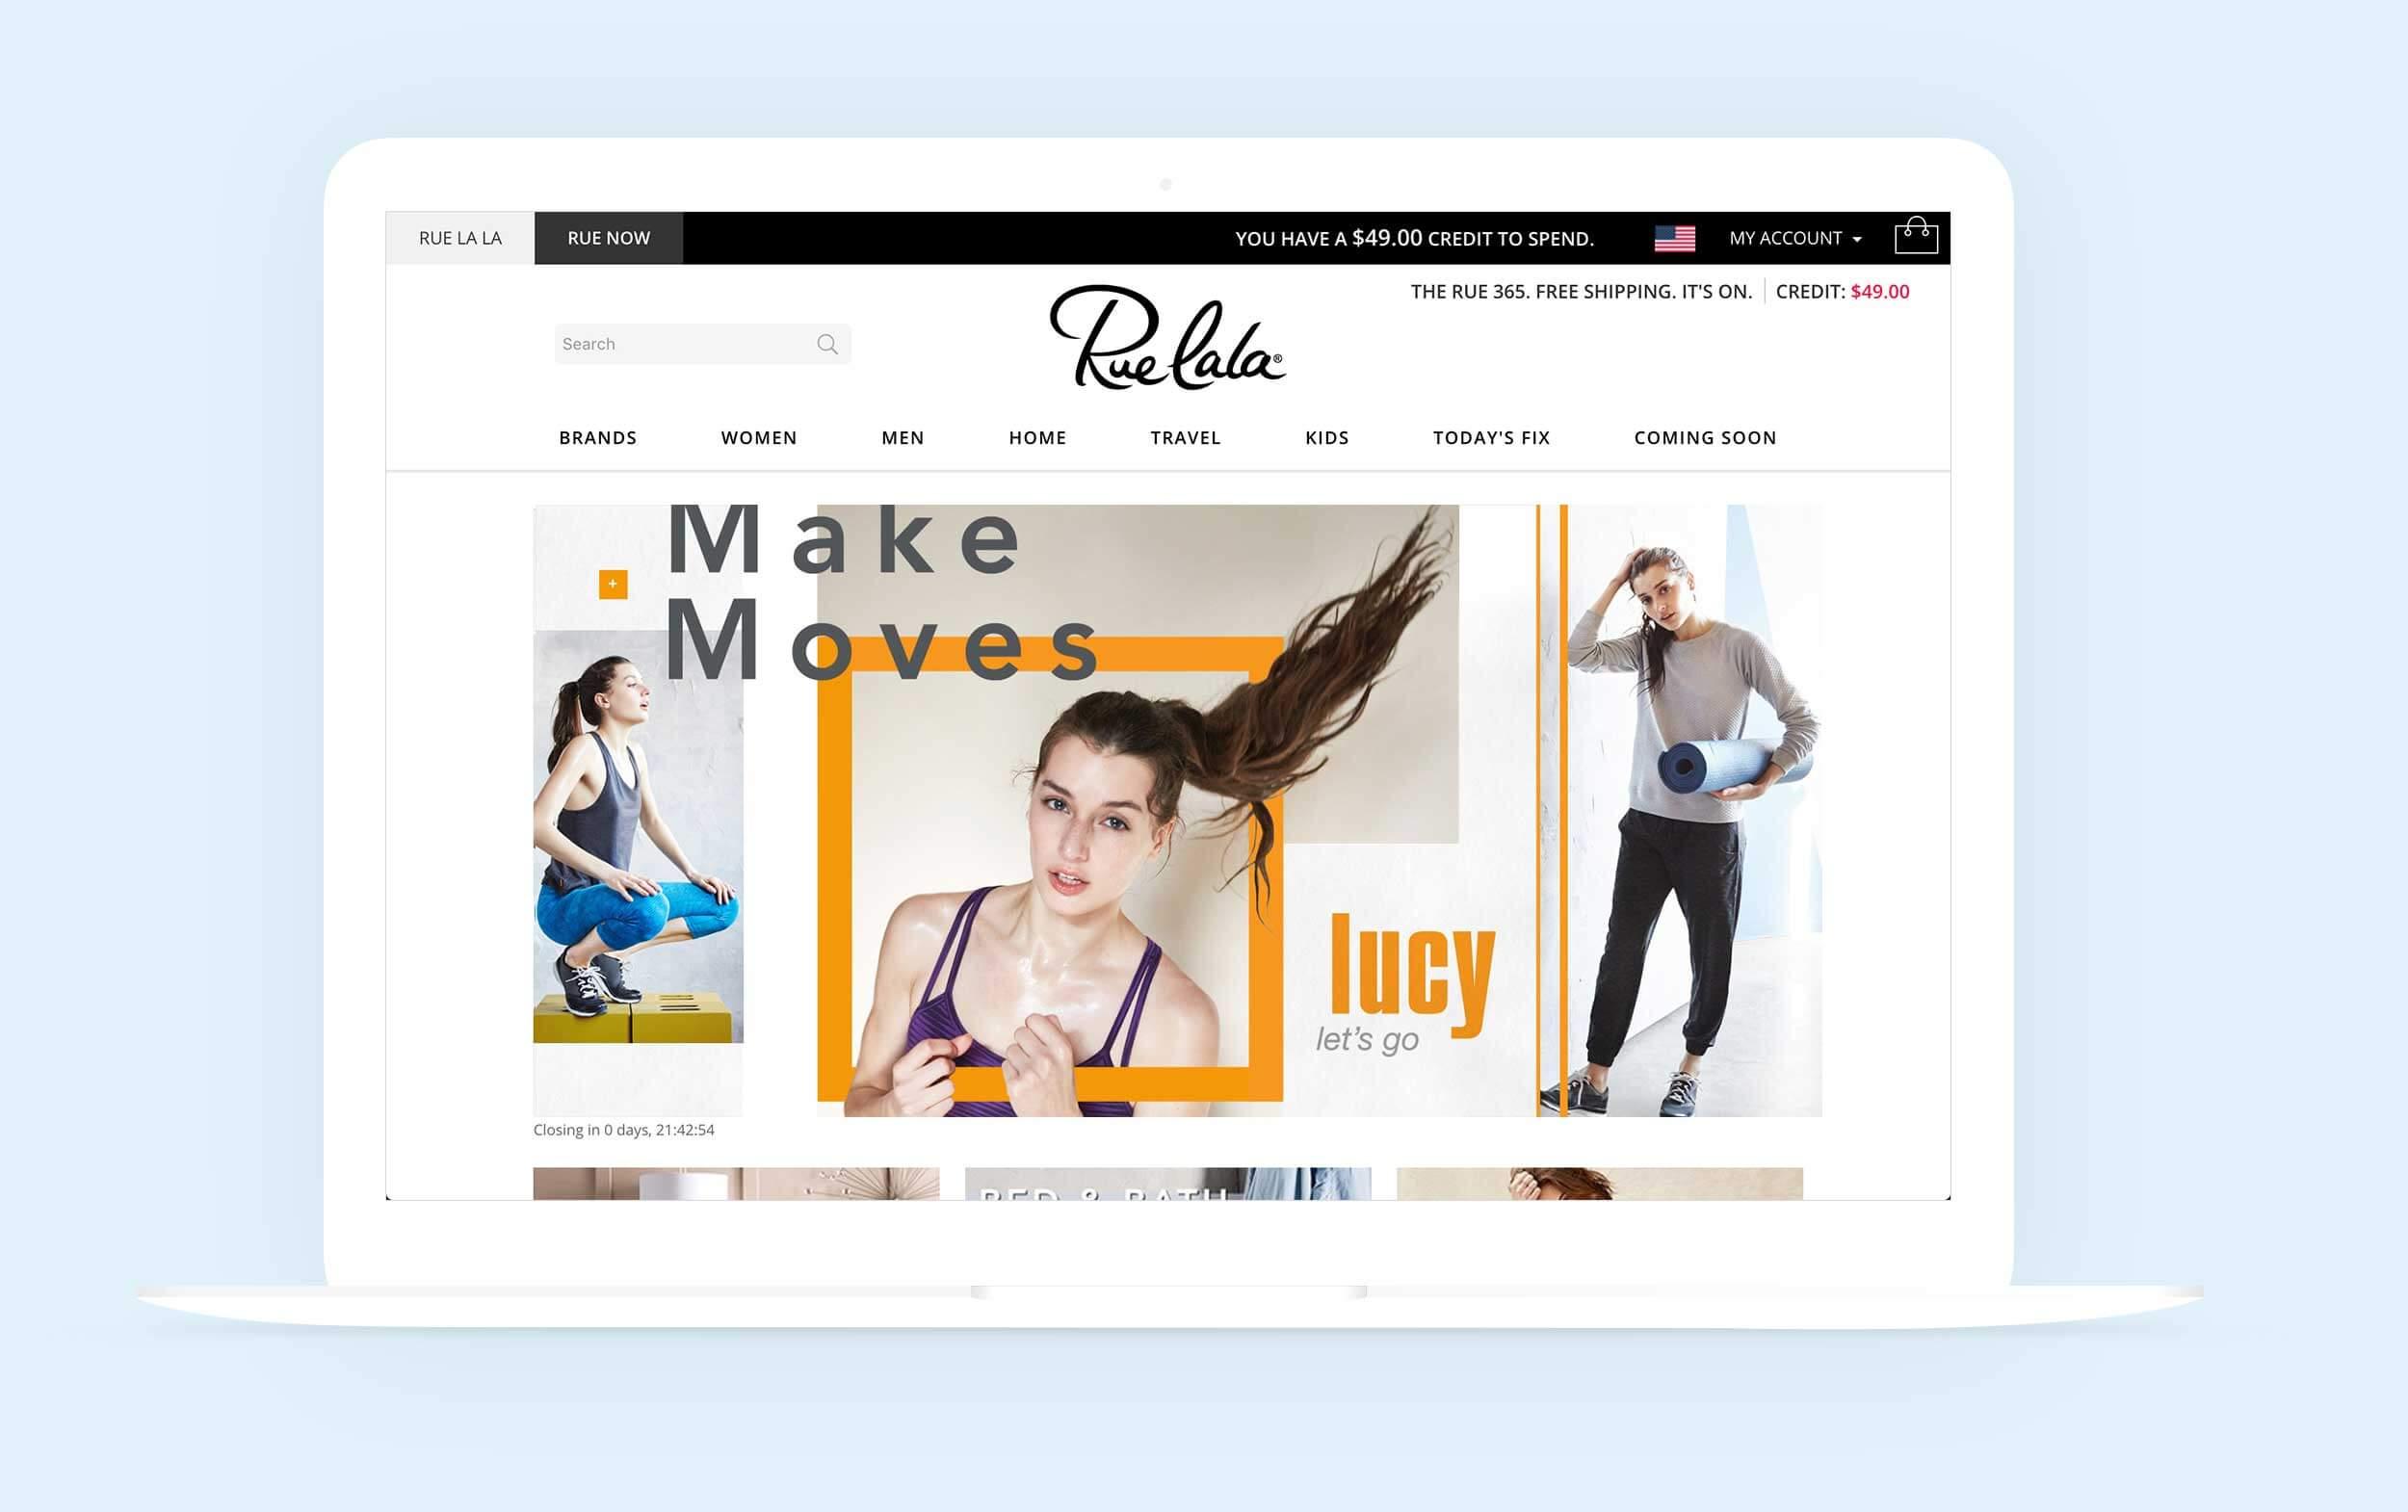 lvg-lvgworks-laura-vanessa-gonzalez-ruelala-lucy-active-activewear-gym-graphic-design-designer-type-typeography-brand-ux-ui-model-fashion-photography-jess-jessica-clemments-onsite-laptop-macbook-.jpg